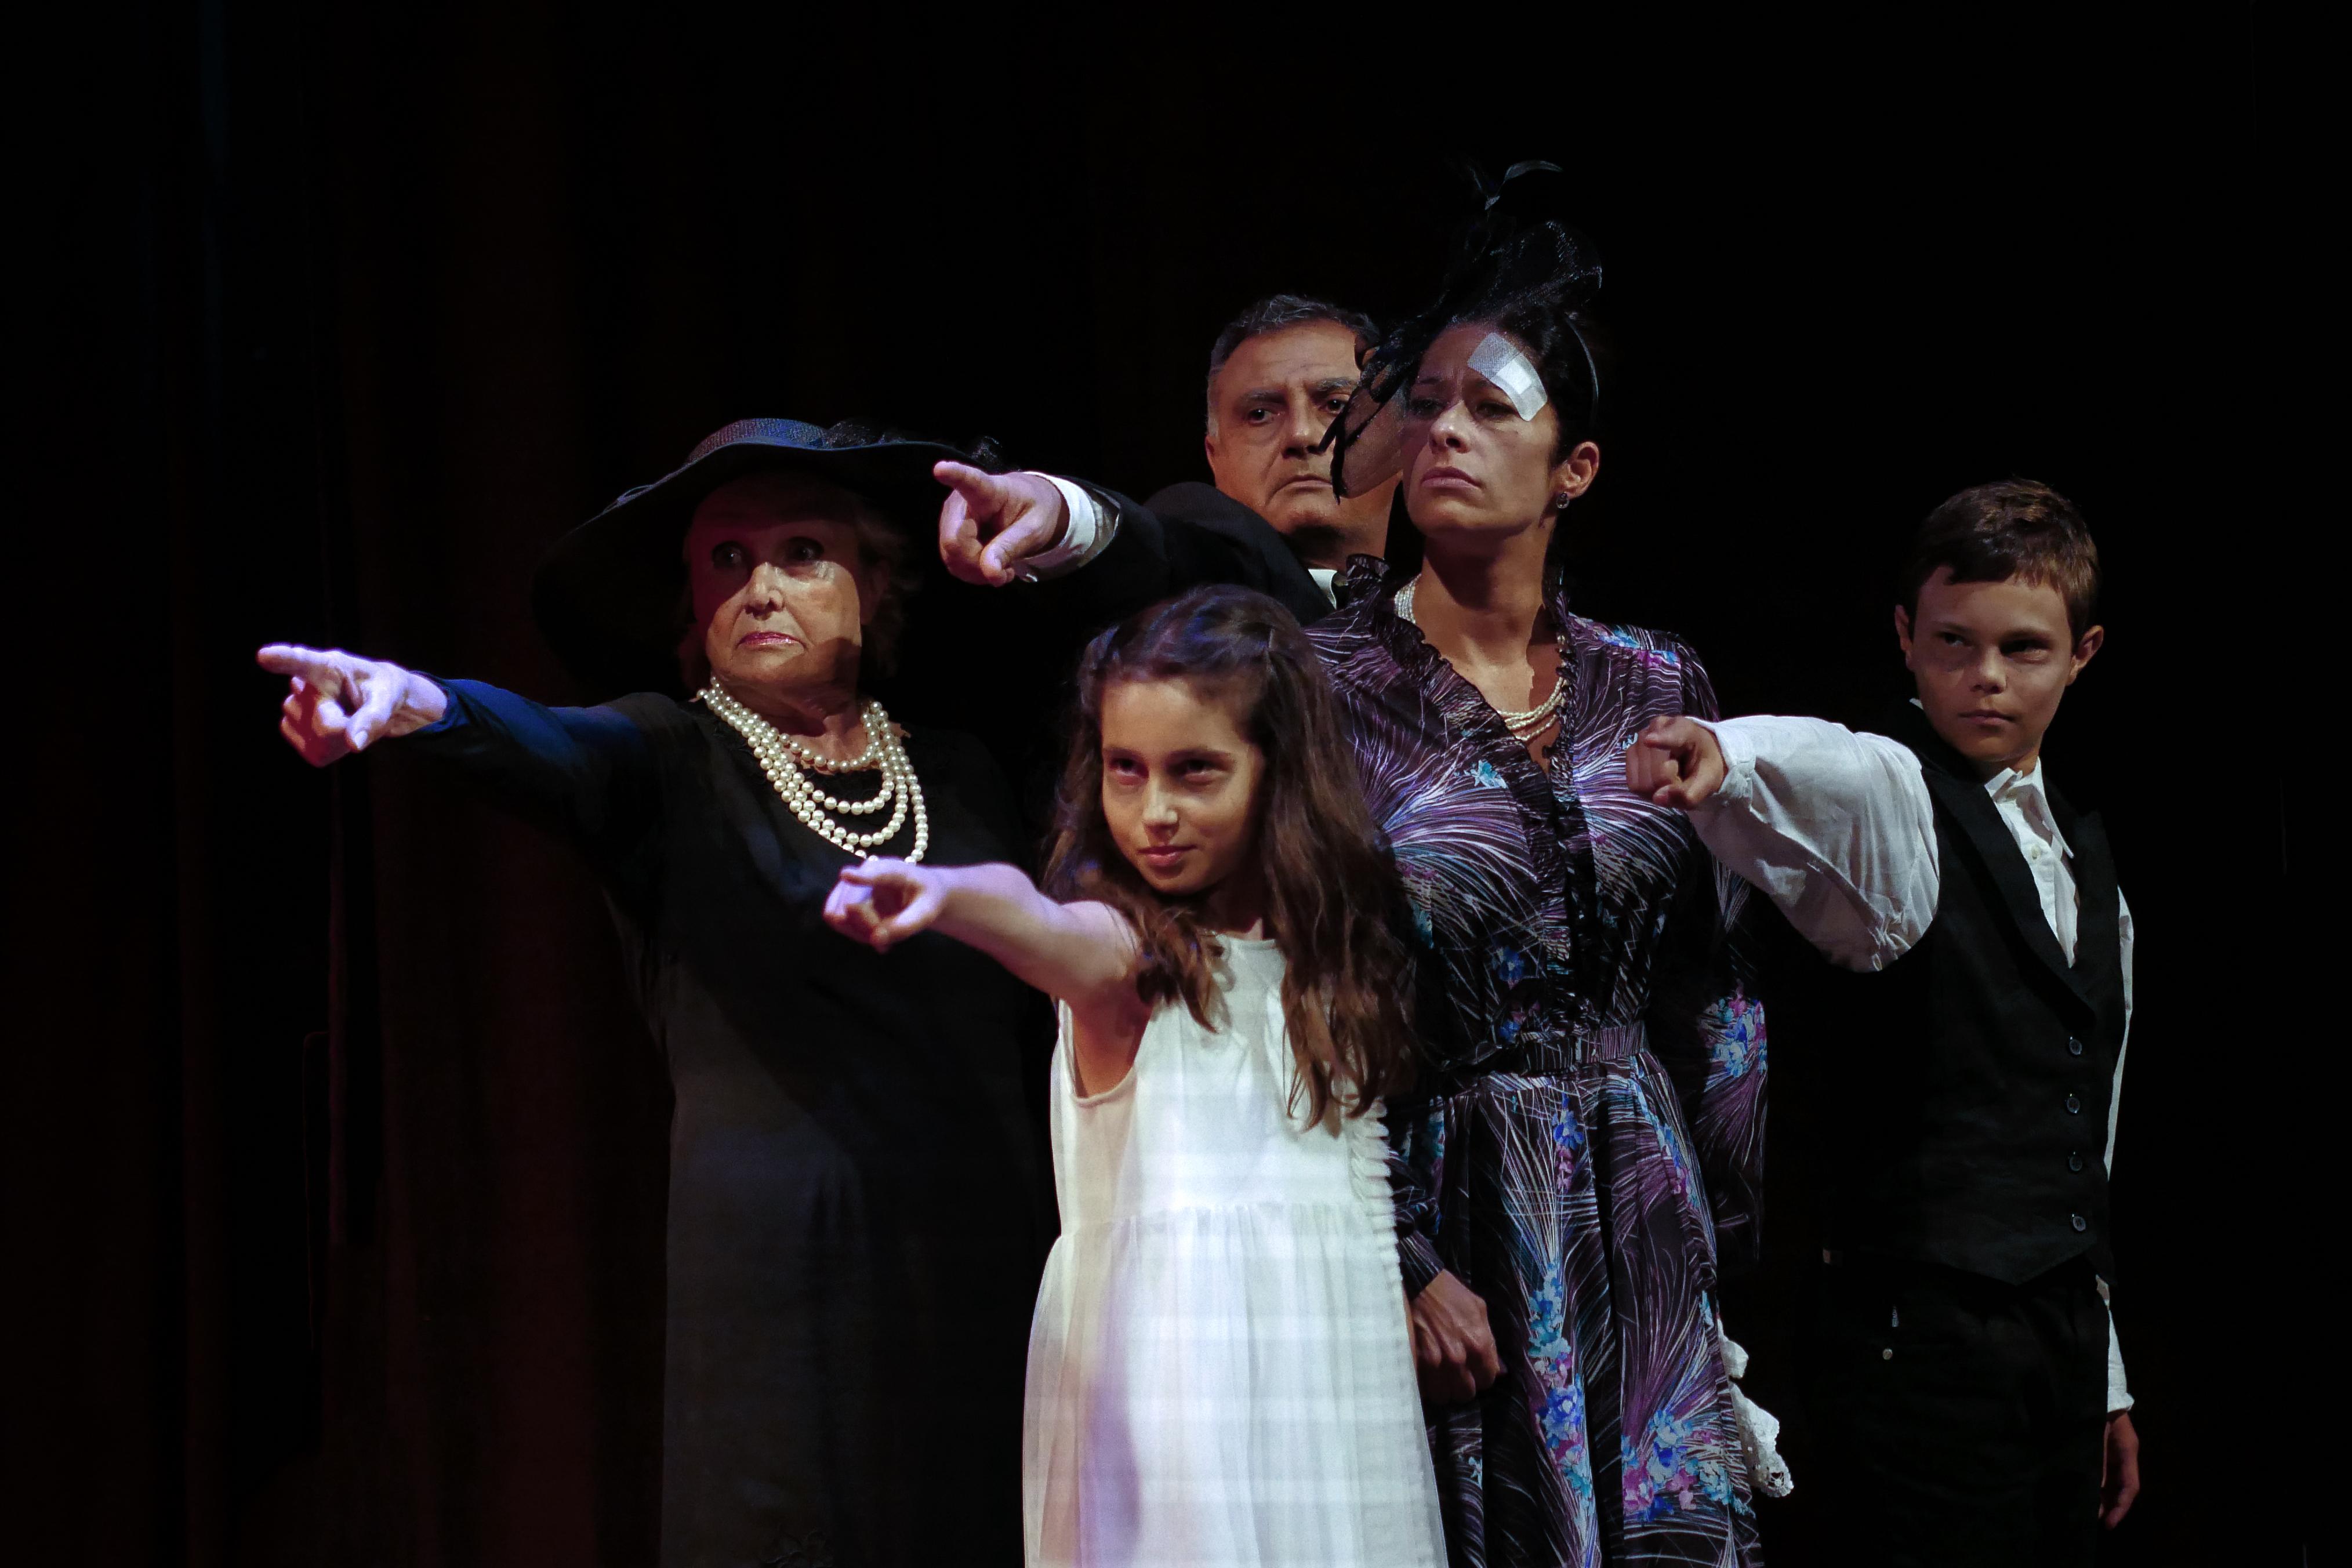 Teatro La Piccola Ribalta di Pesaro -  Questi Fantasmi